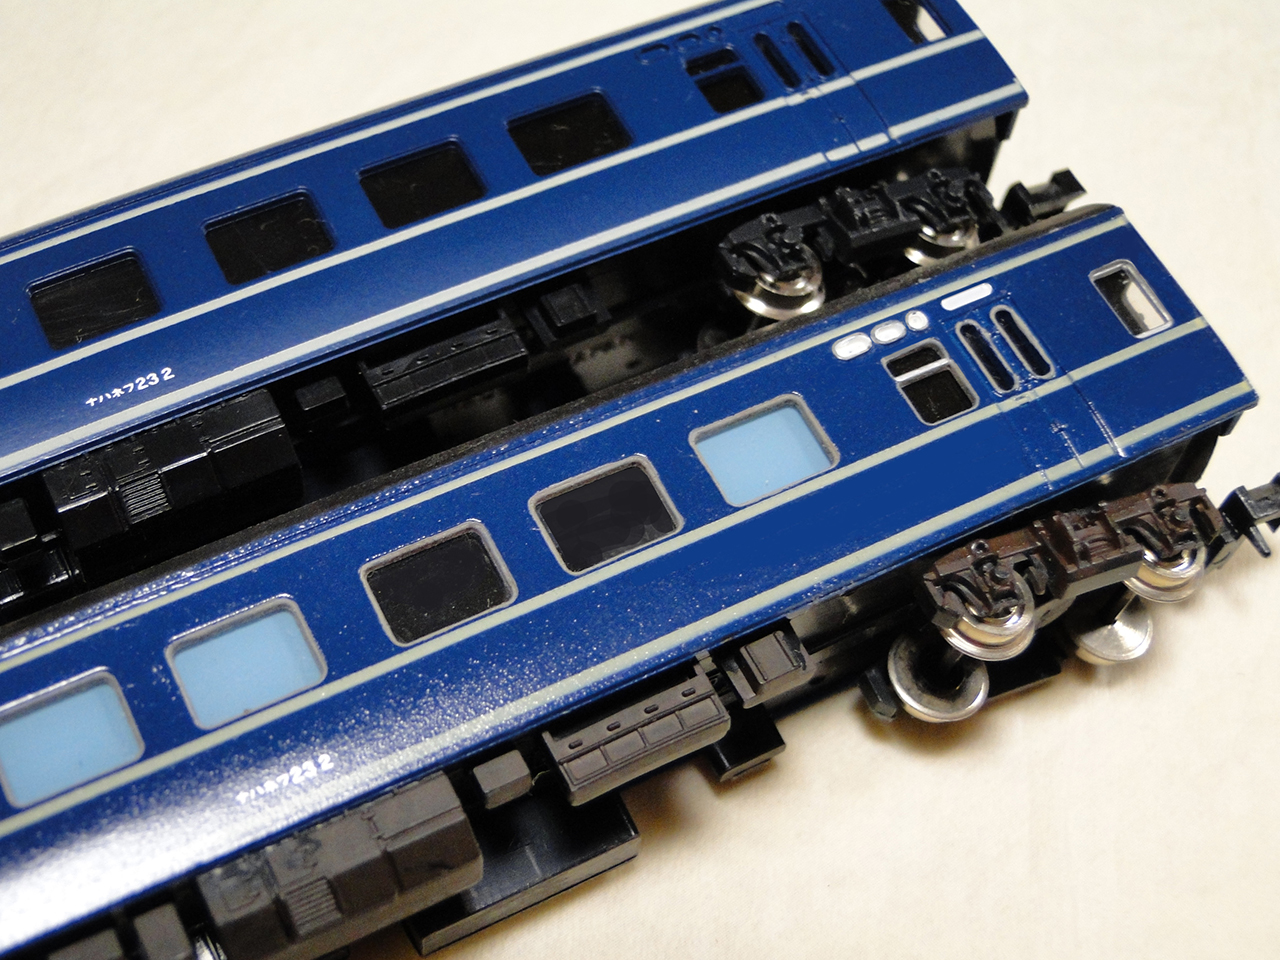 http://moritetsu.info/model-railway/img/DSC08527s.jpg